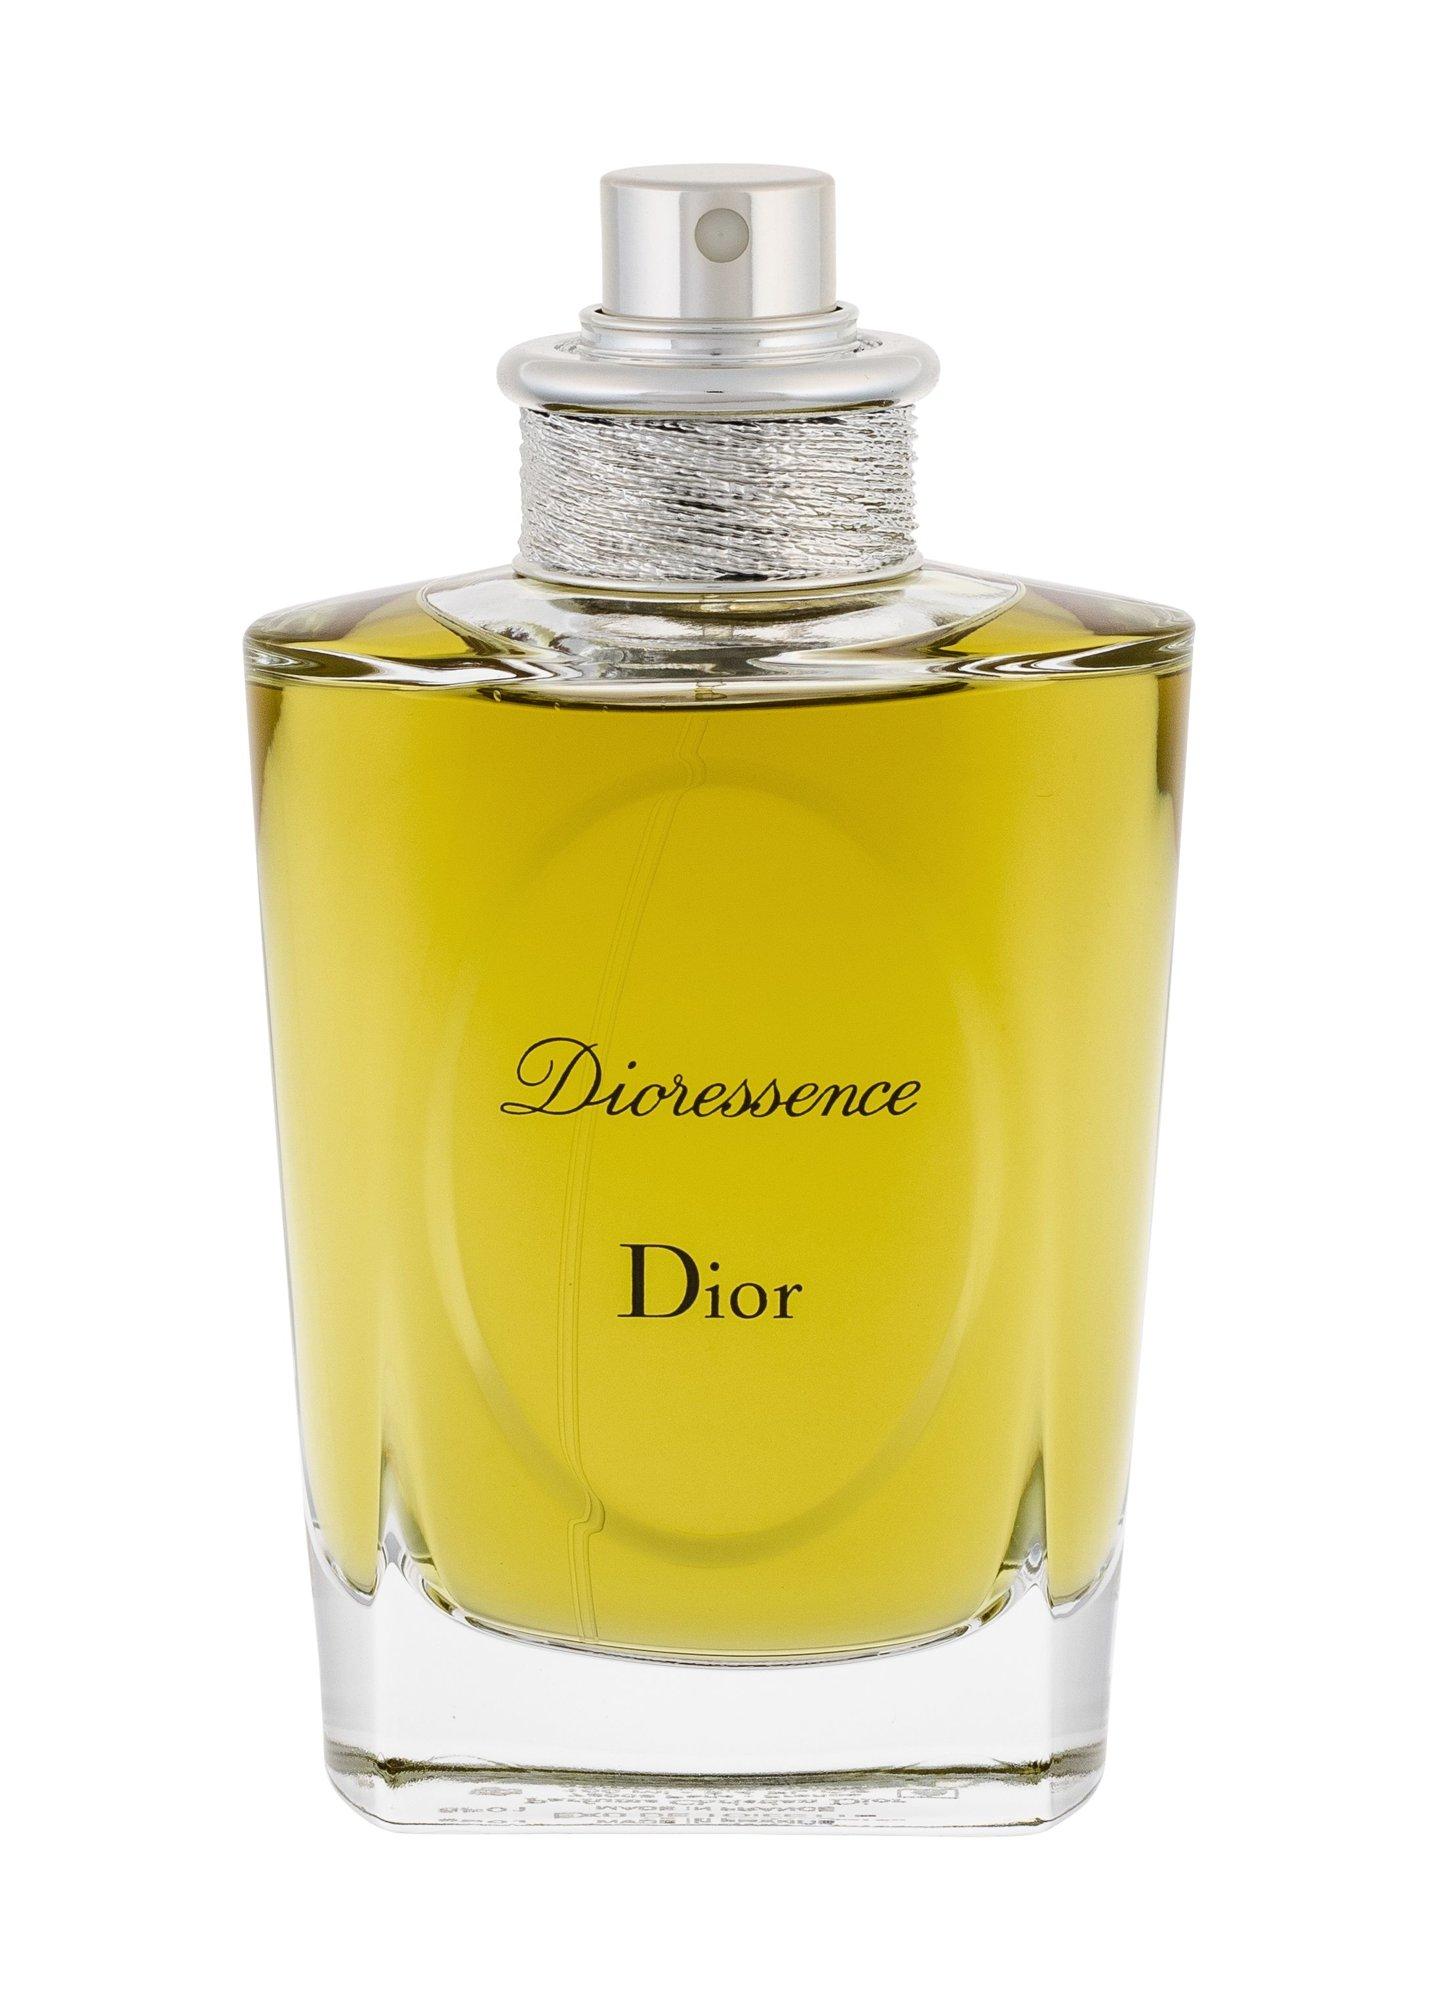 Christian Dior Les Creations de Monsieur Dior Dioressence EDT 100ml